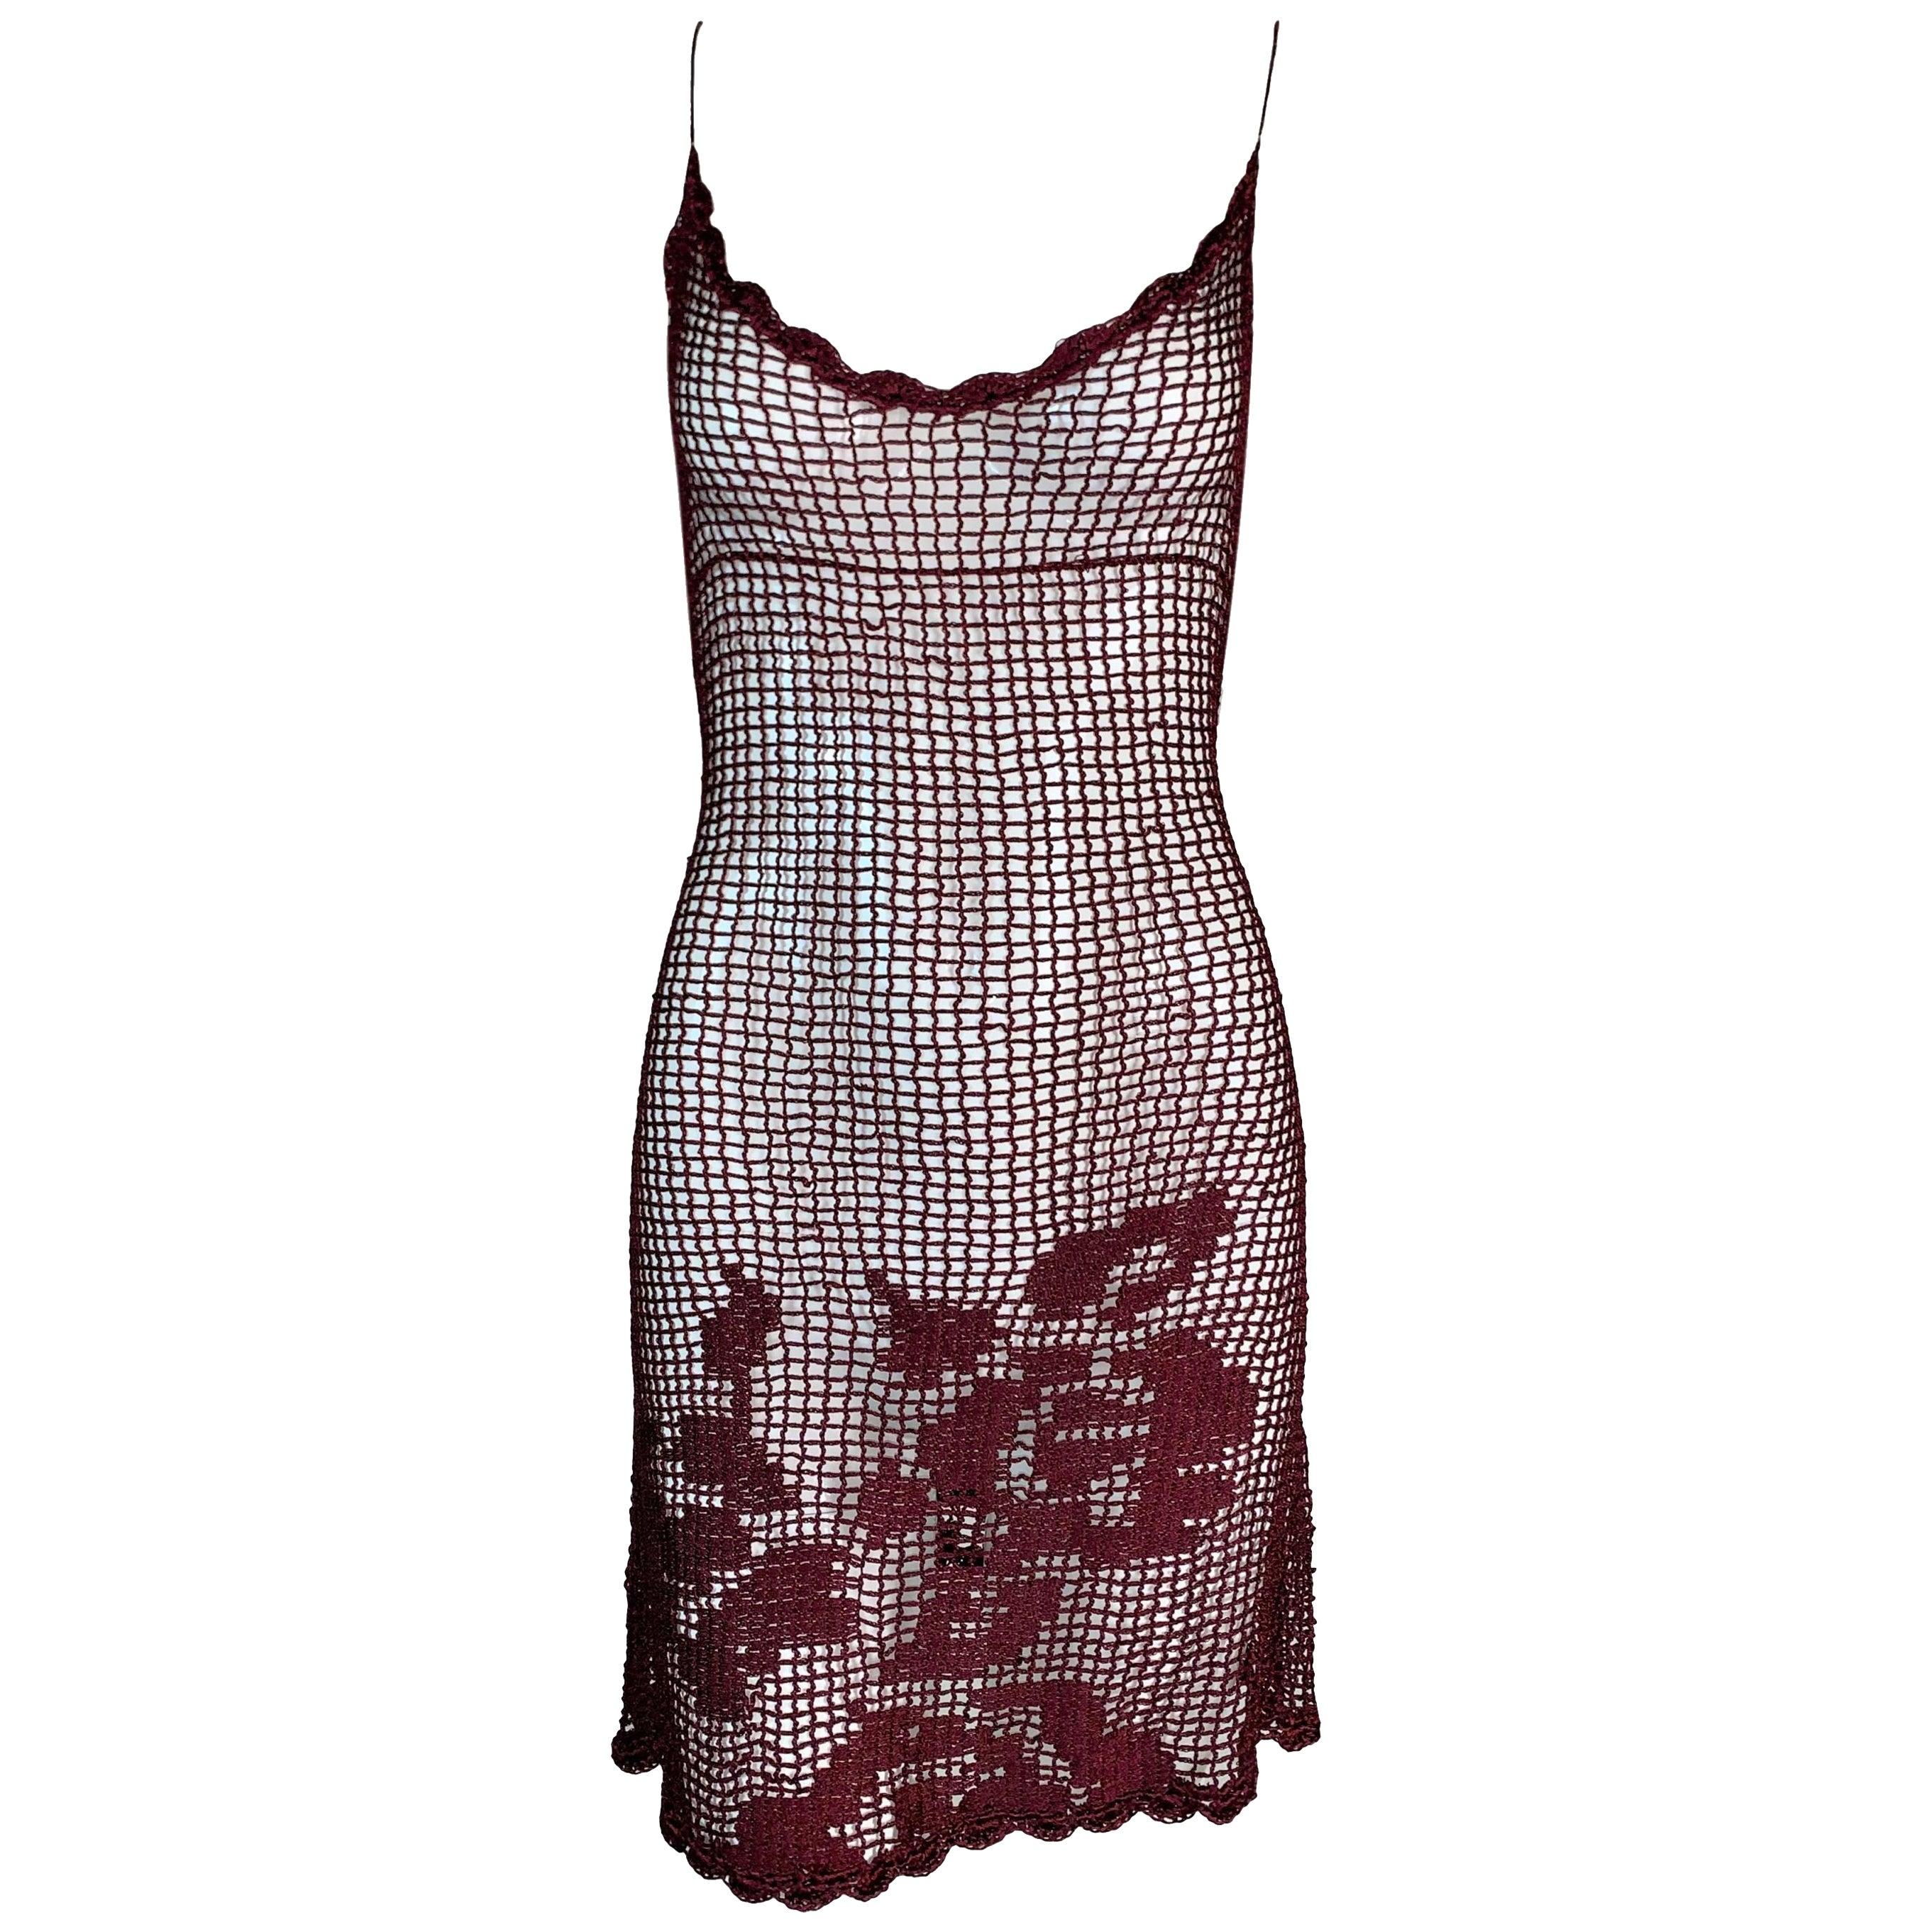 F/W 1997 Dolce & Gabbana Runway Sheer Burgundy Knit Mini Dress